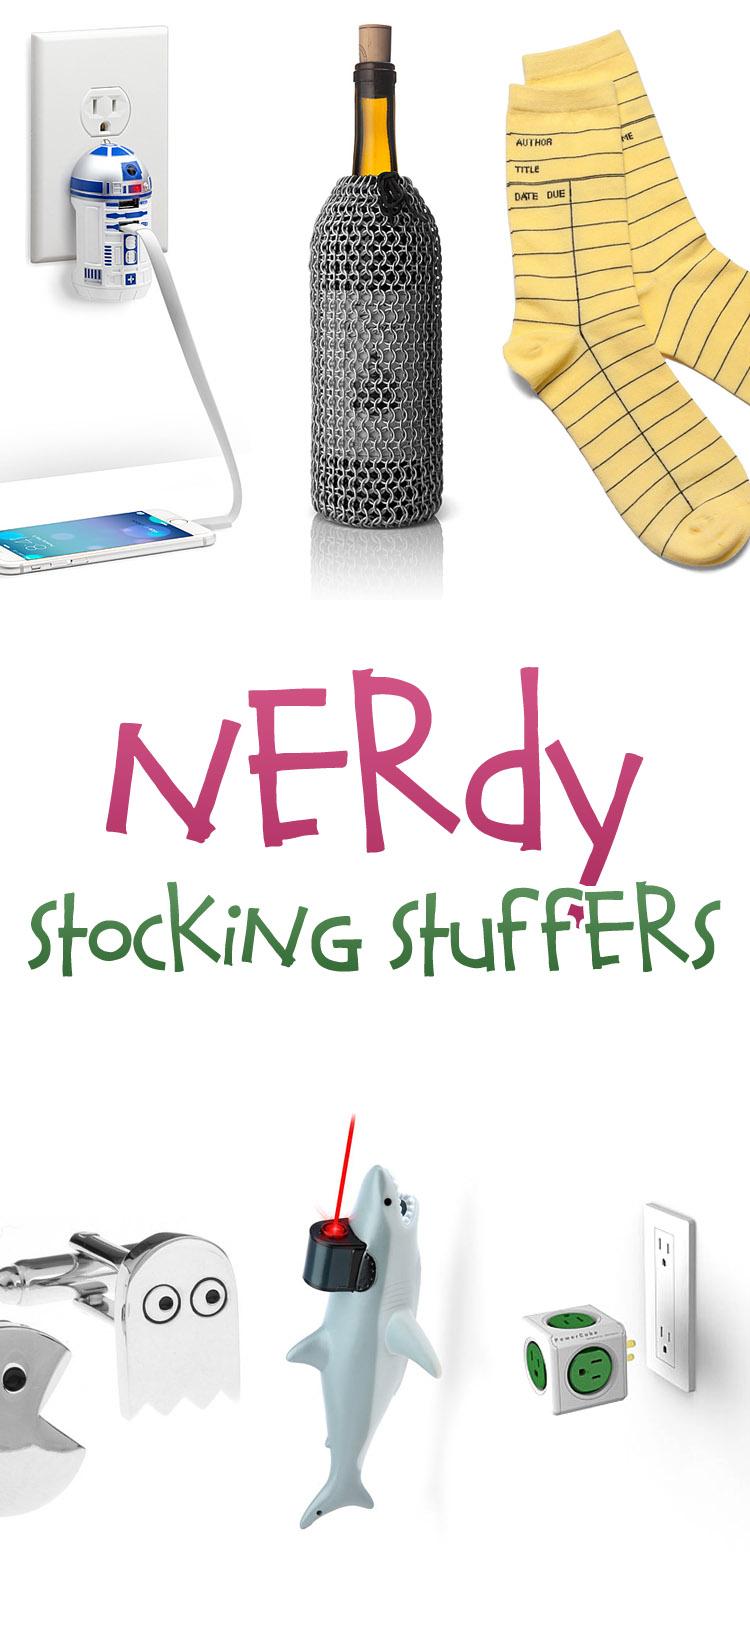 nerdy-stockingstuffers-tower-1